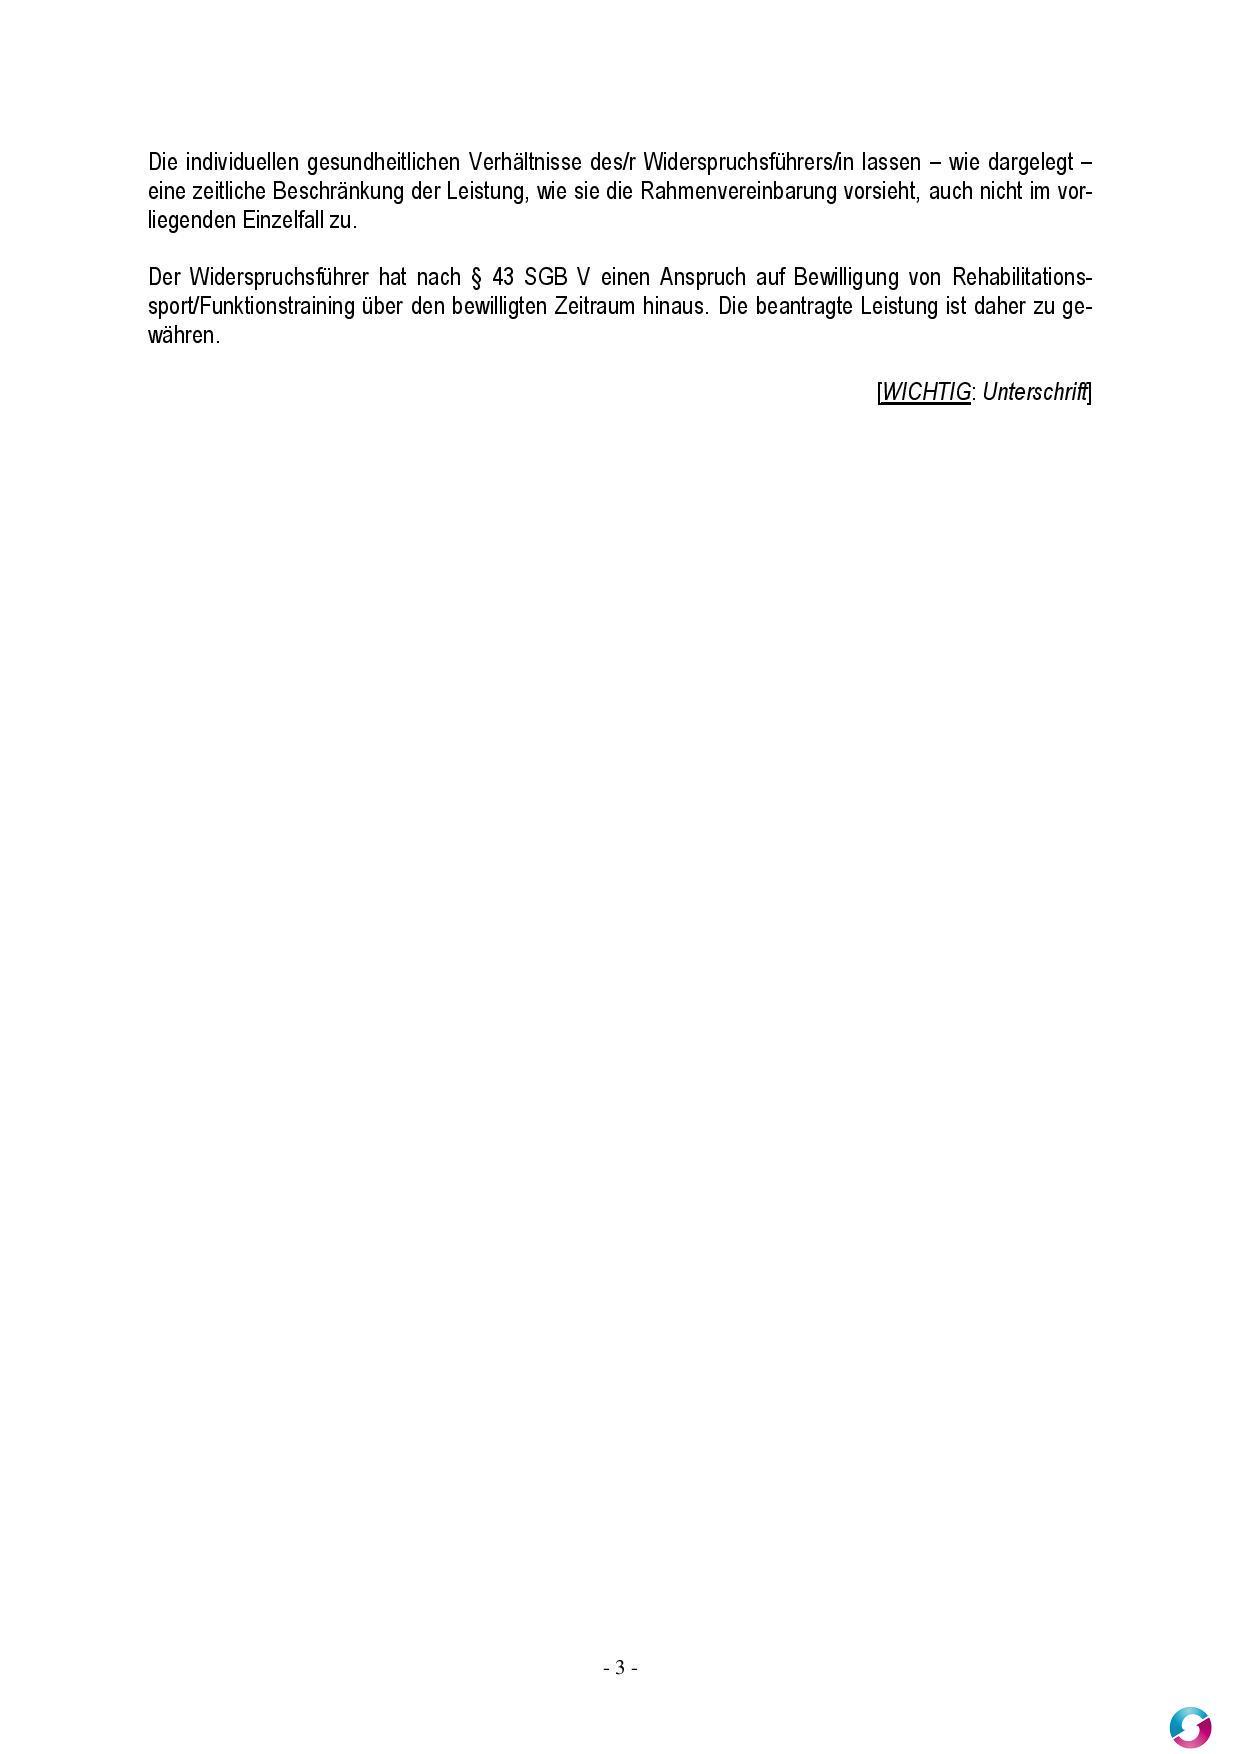 widerspruch funktionstraining sonstiges teramed - Widerspruch Krankenkasse Muster